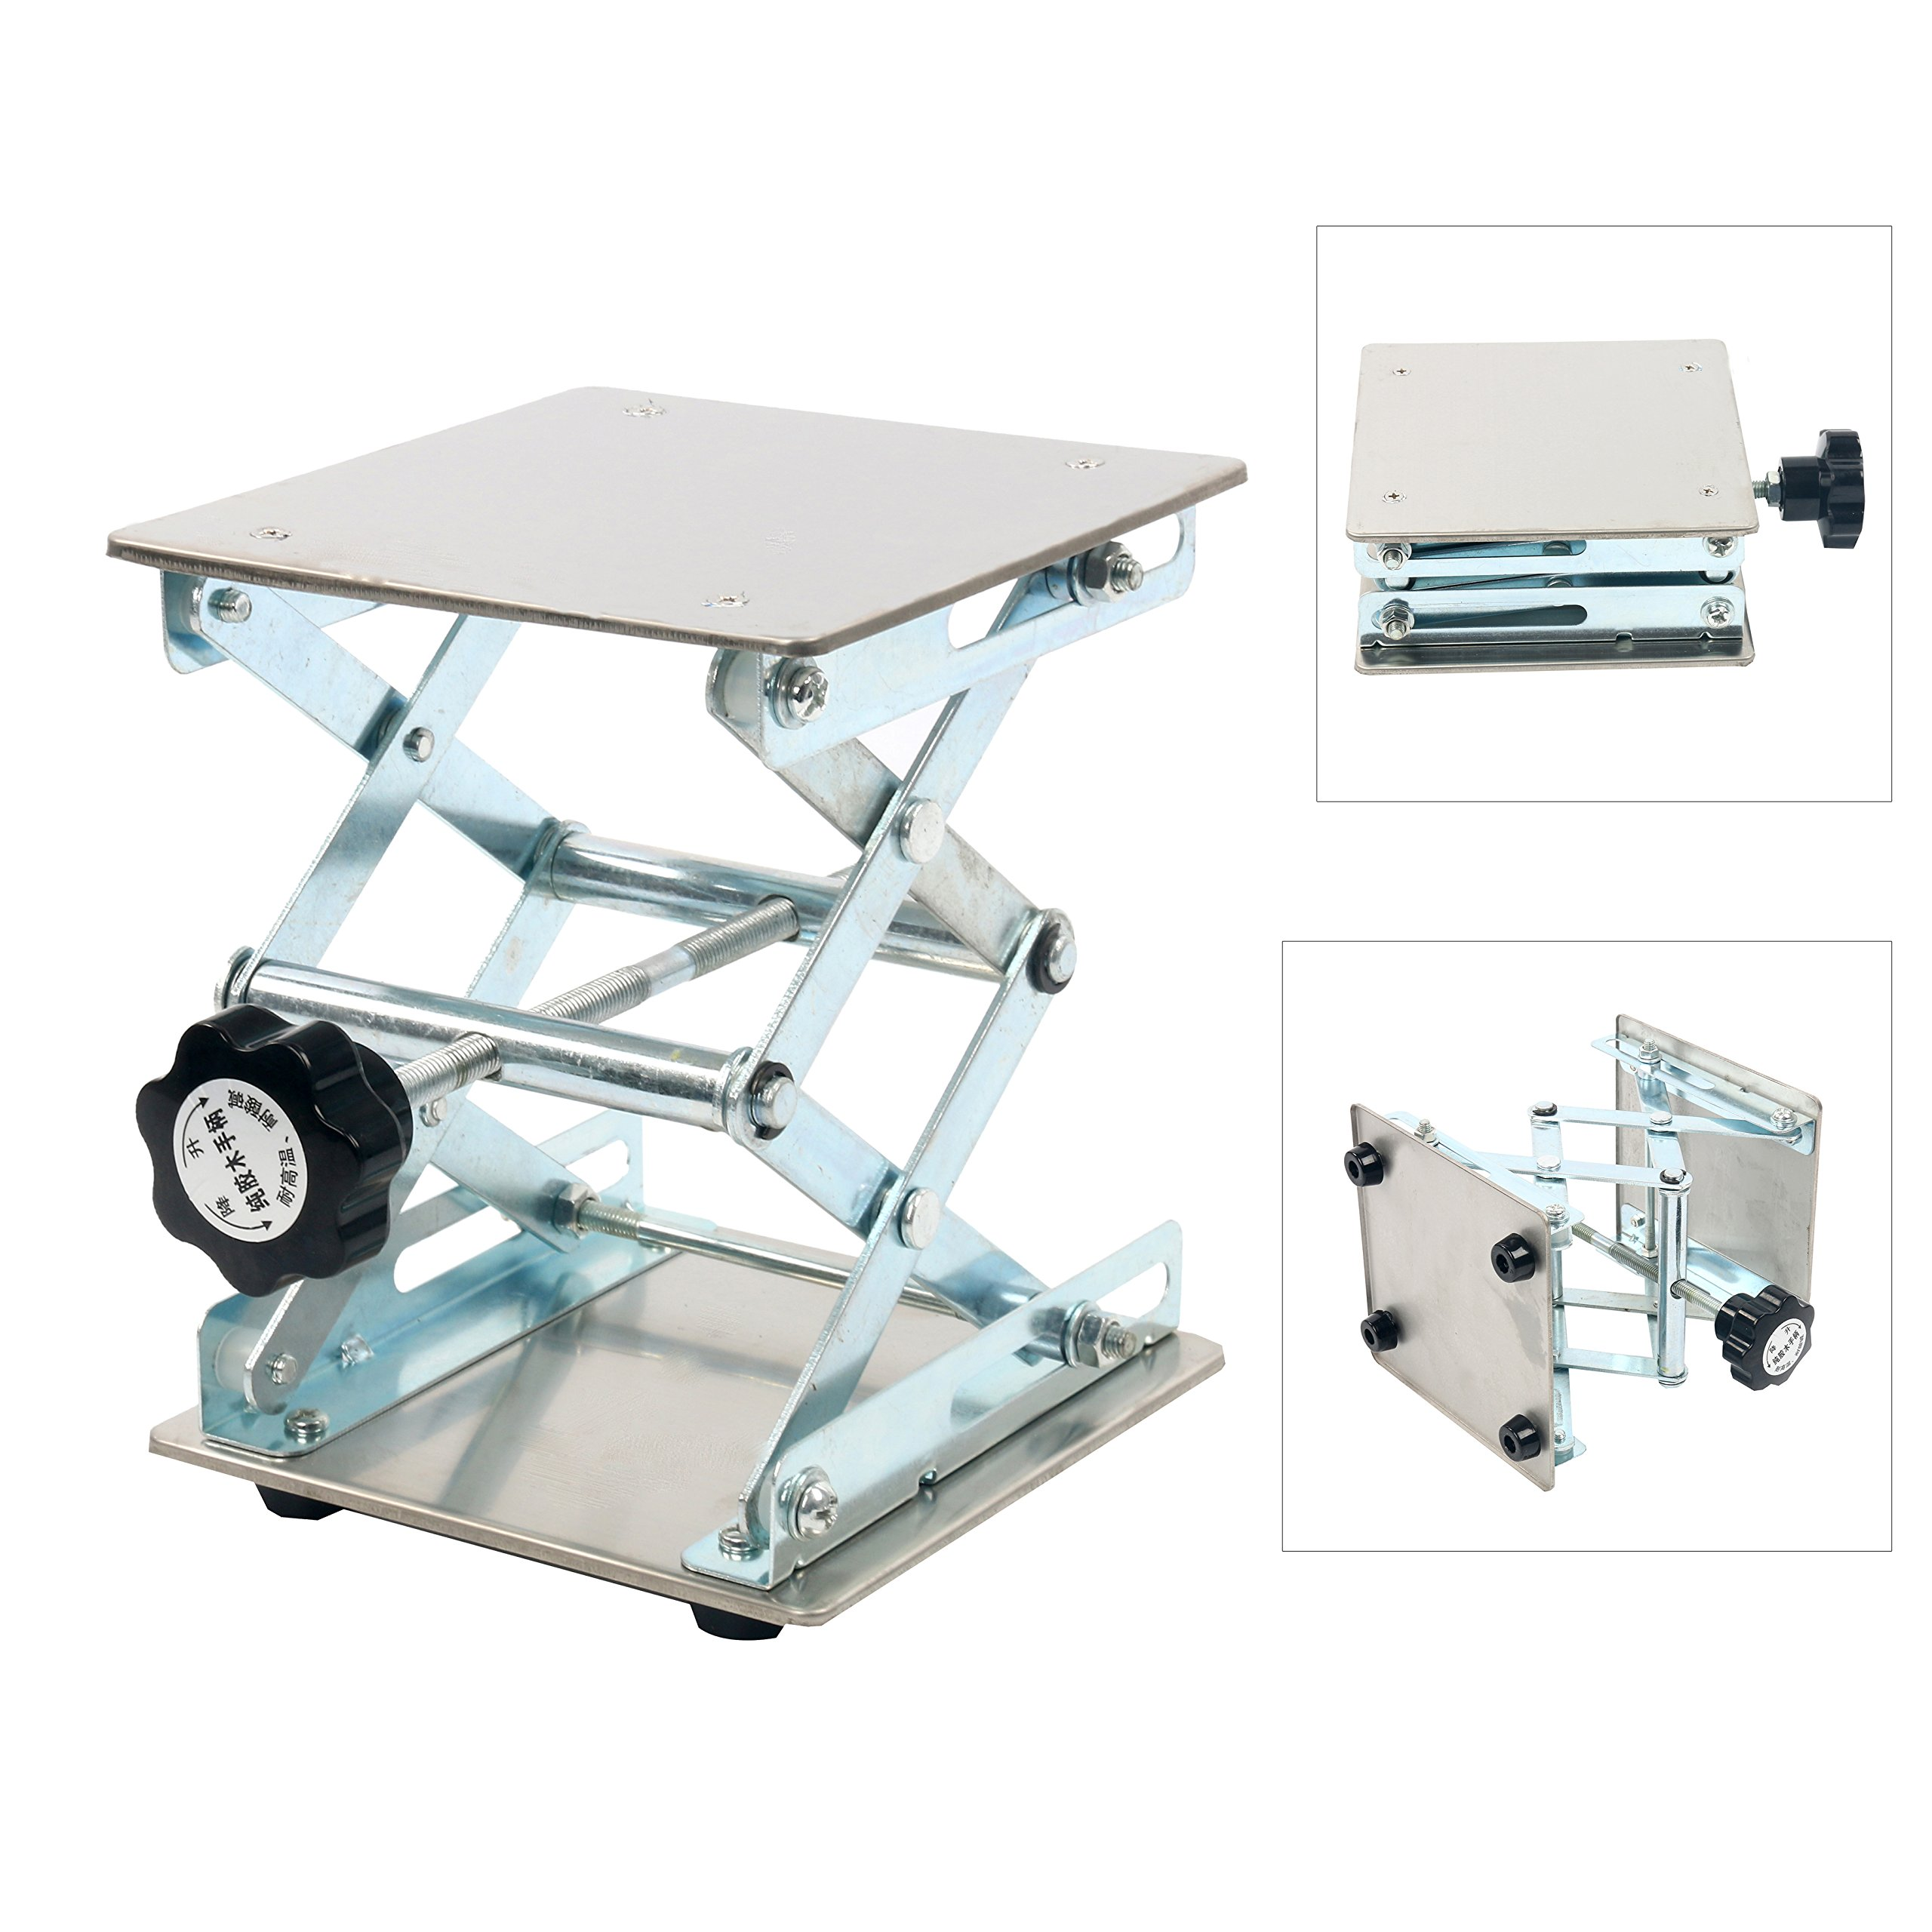 YaeTek 6 x 6'' Lab Jack - Heavy Duty Laboratory Scissor Jack - Stainless Steel Platform Lab Stand Table Scissor Lift laboratory Jiffy Jack (6 Inch by 6 Inch)